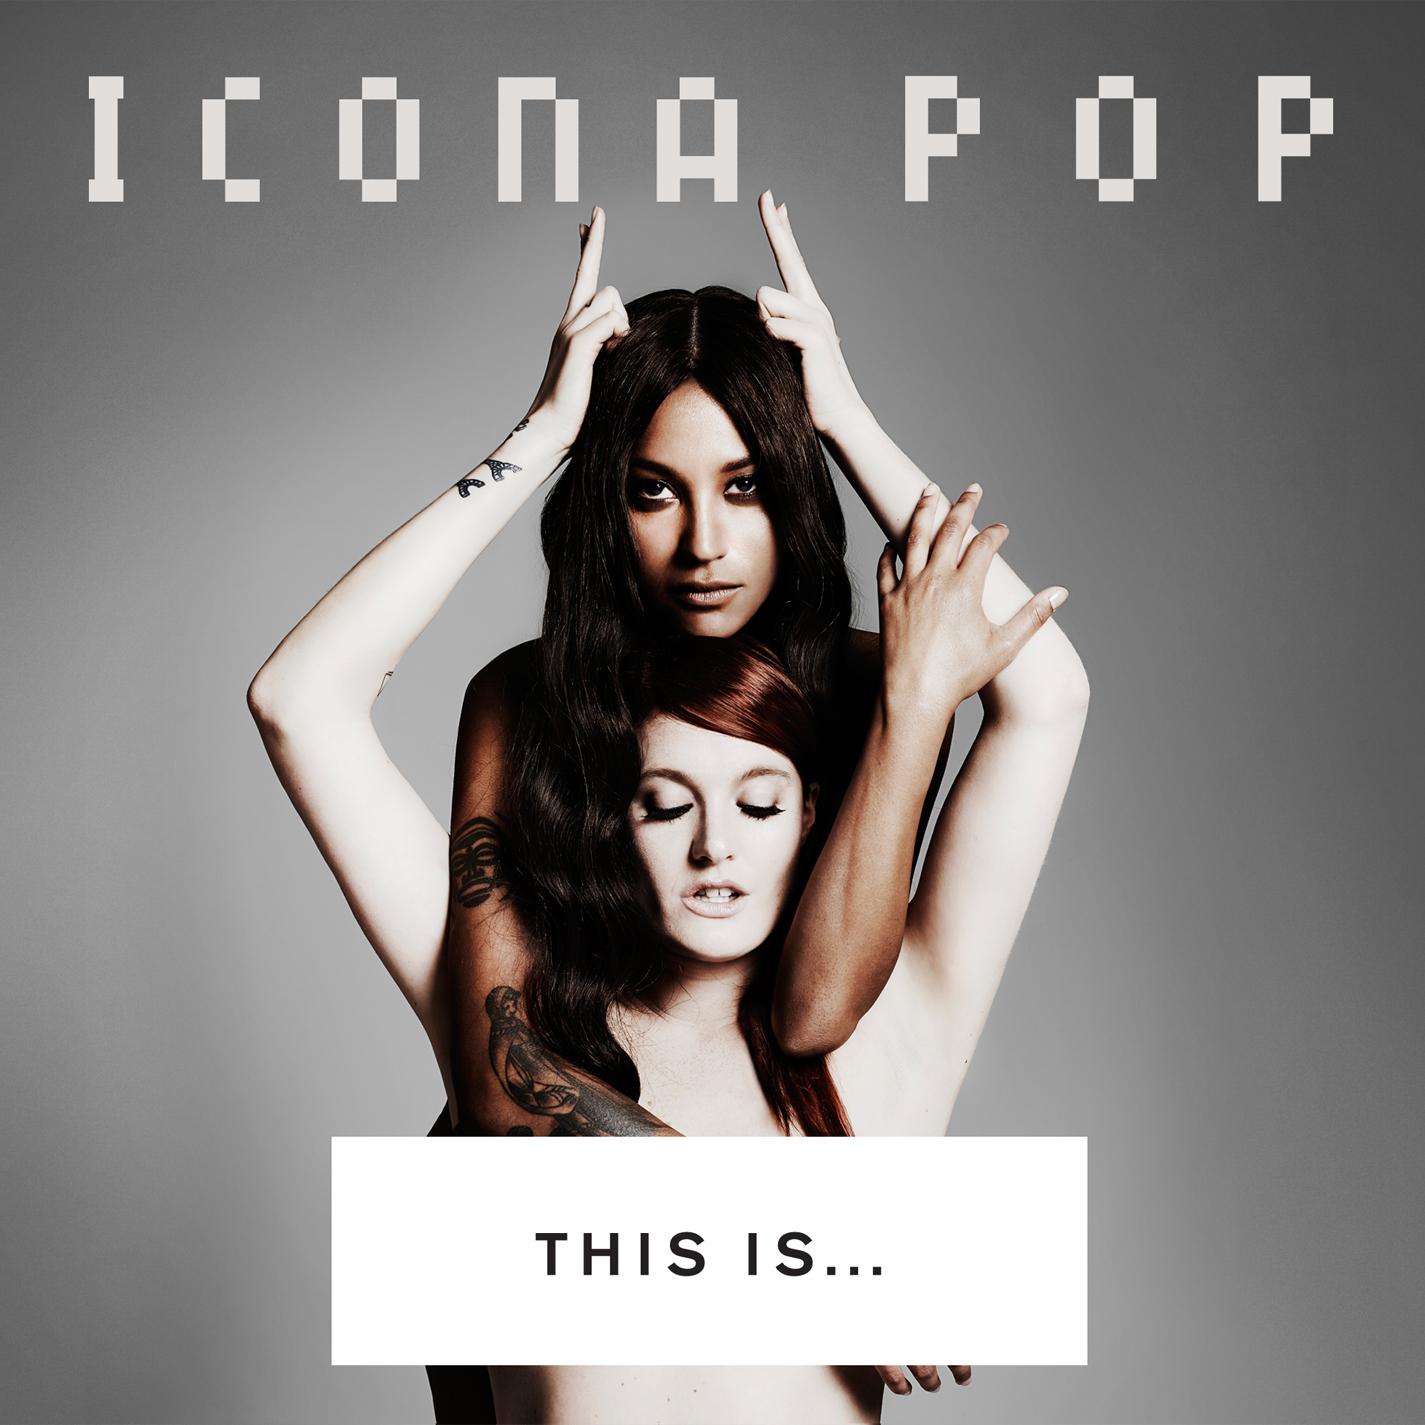 Icona Pop's This Is... album cover